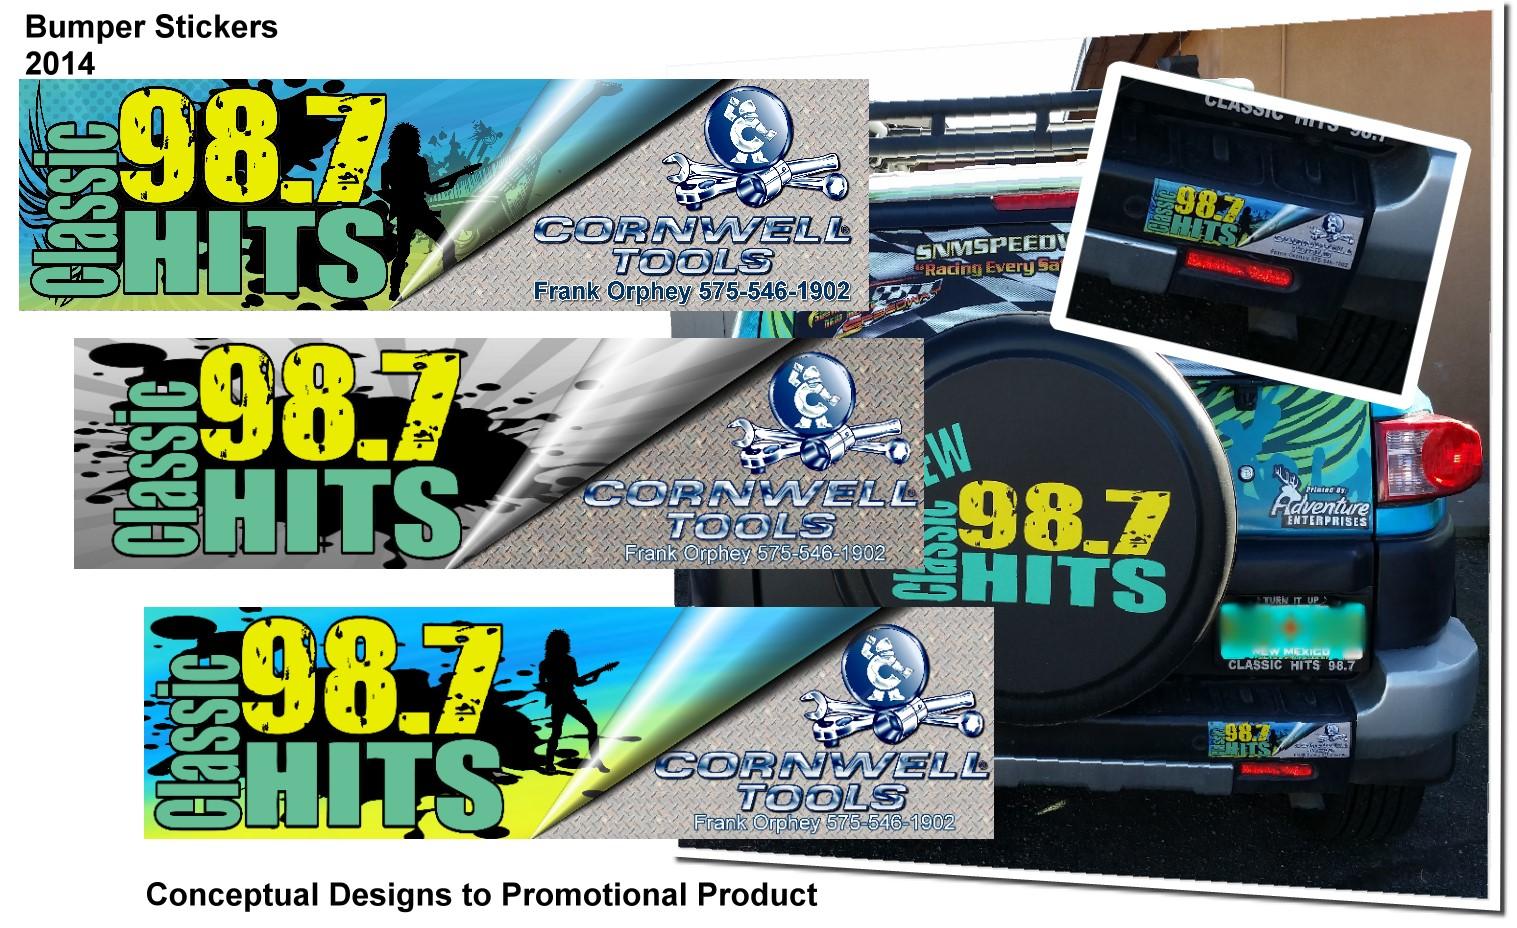 Car sticker design sample - Sponsored Bumper Stickers For Radio Contest Promotion